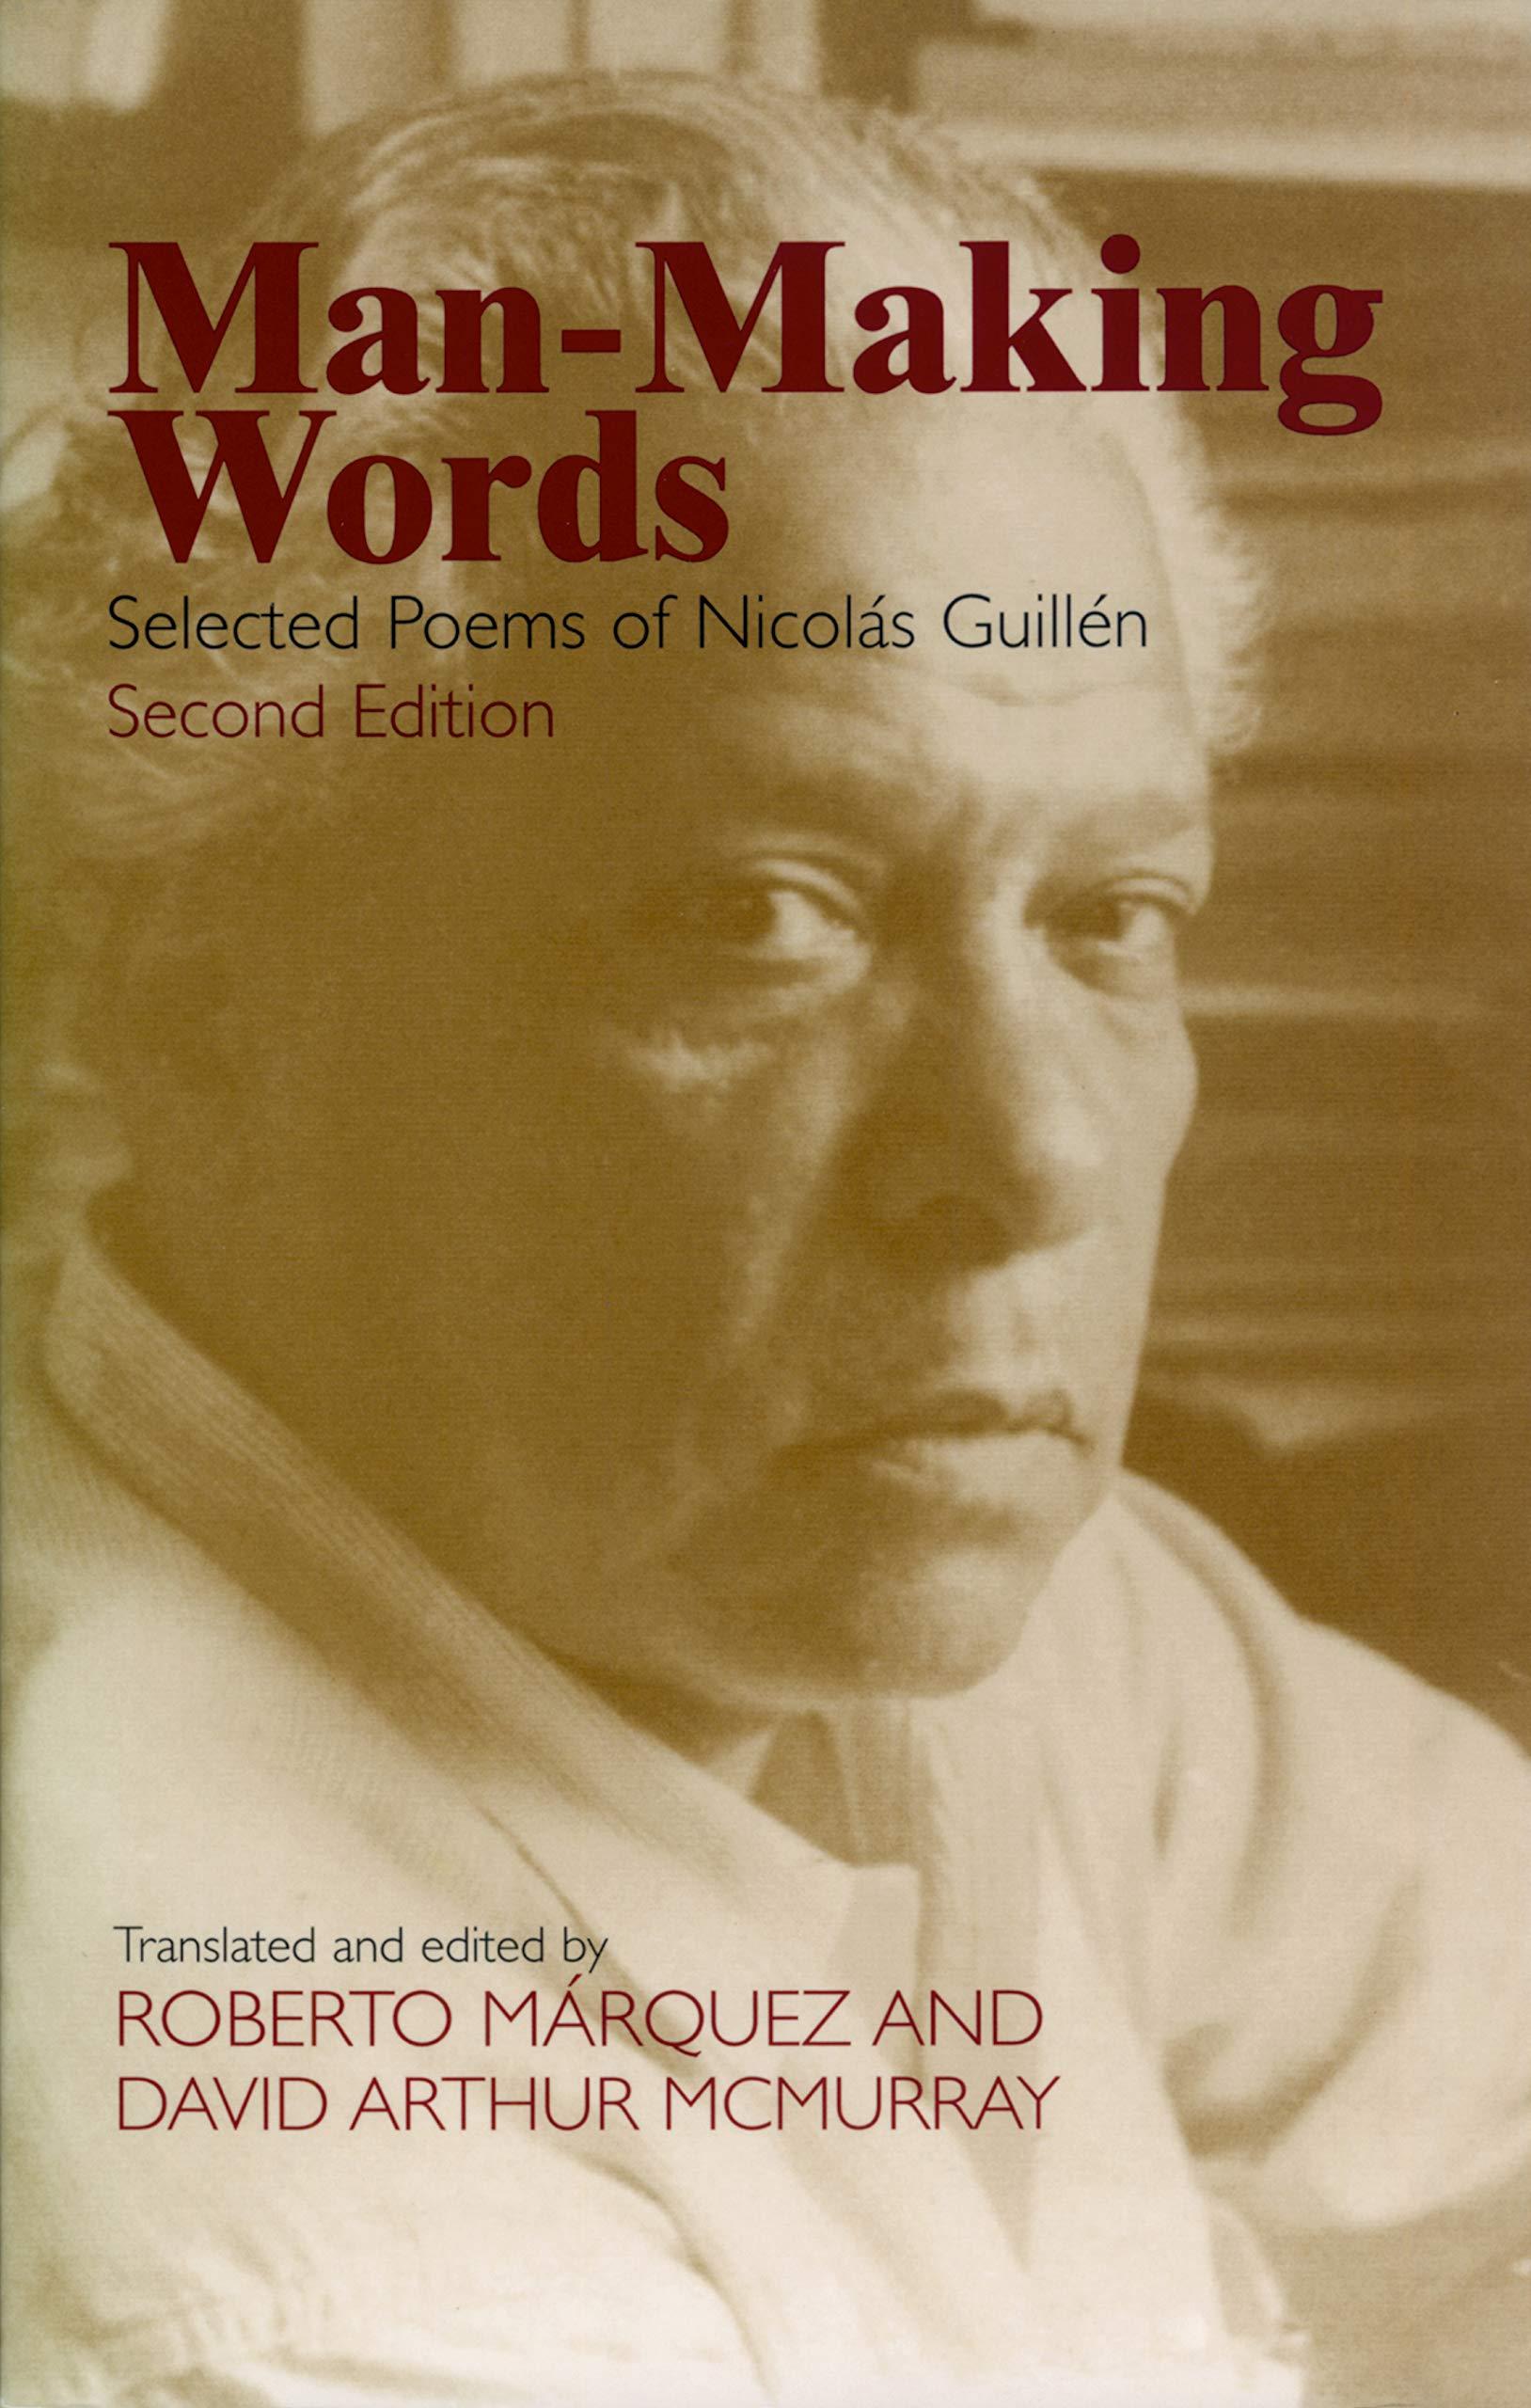 Man-Making Words: Selected Poems of Nicolas Guillen: Guillen, Nicolas,  Marquez, Roberto, McMurray, David Arthur: 9781558494107: Amazon.com: Books